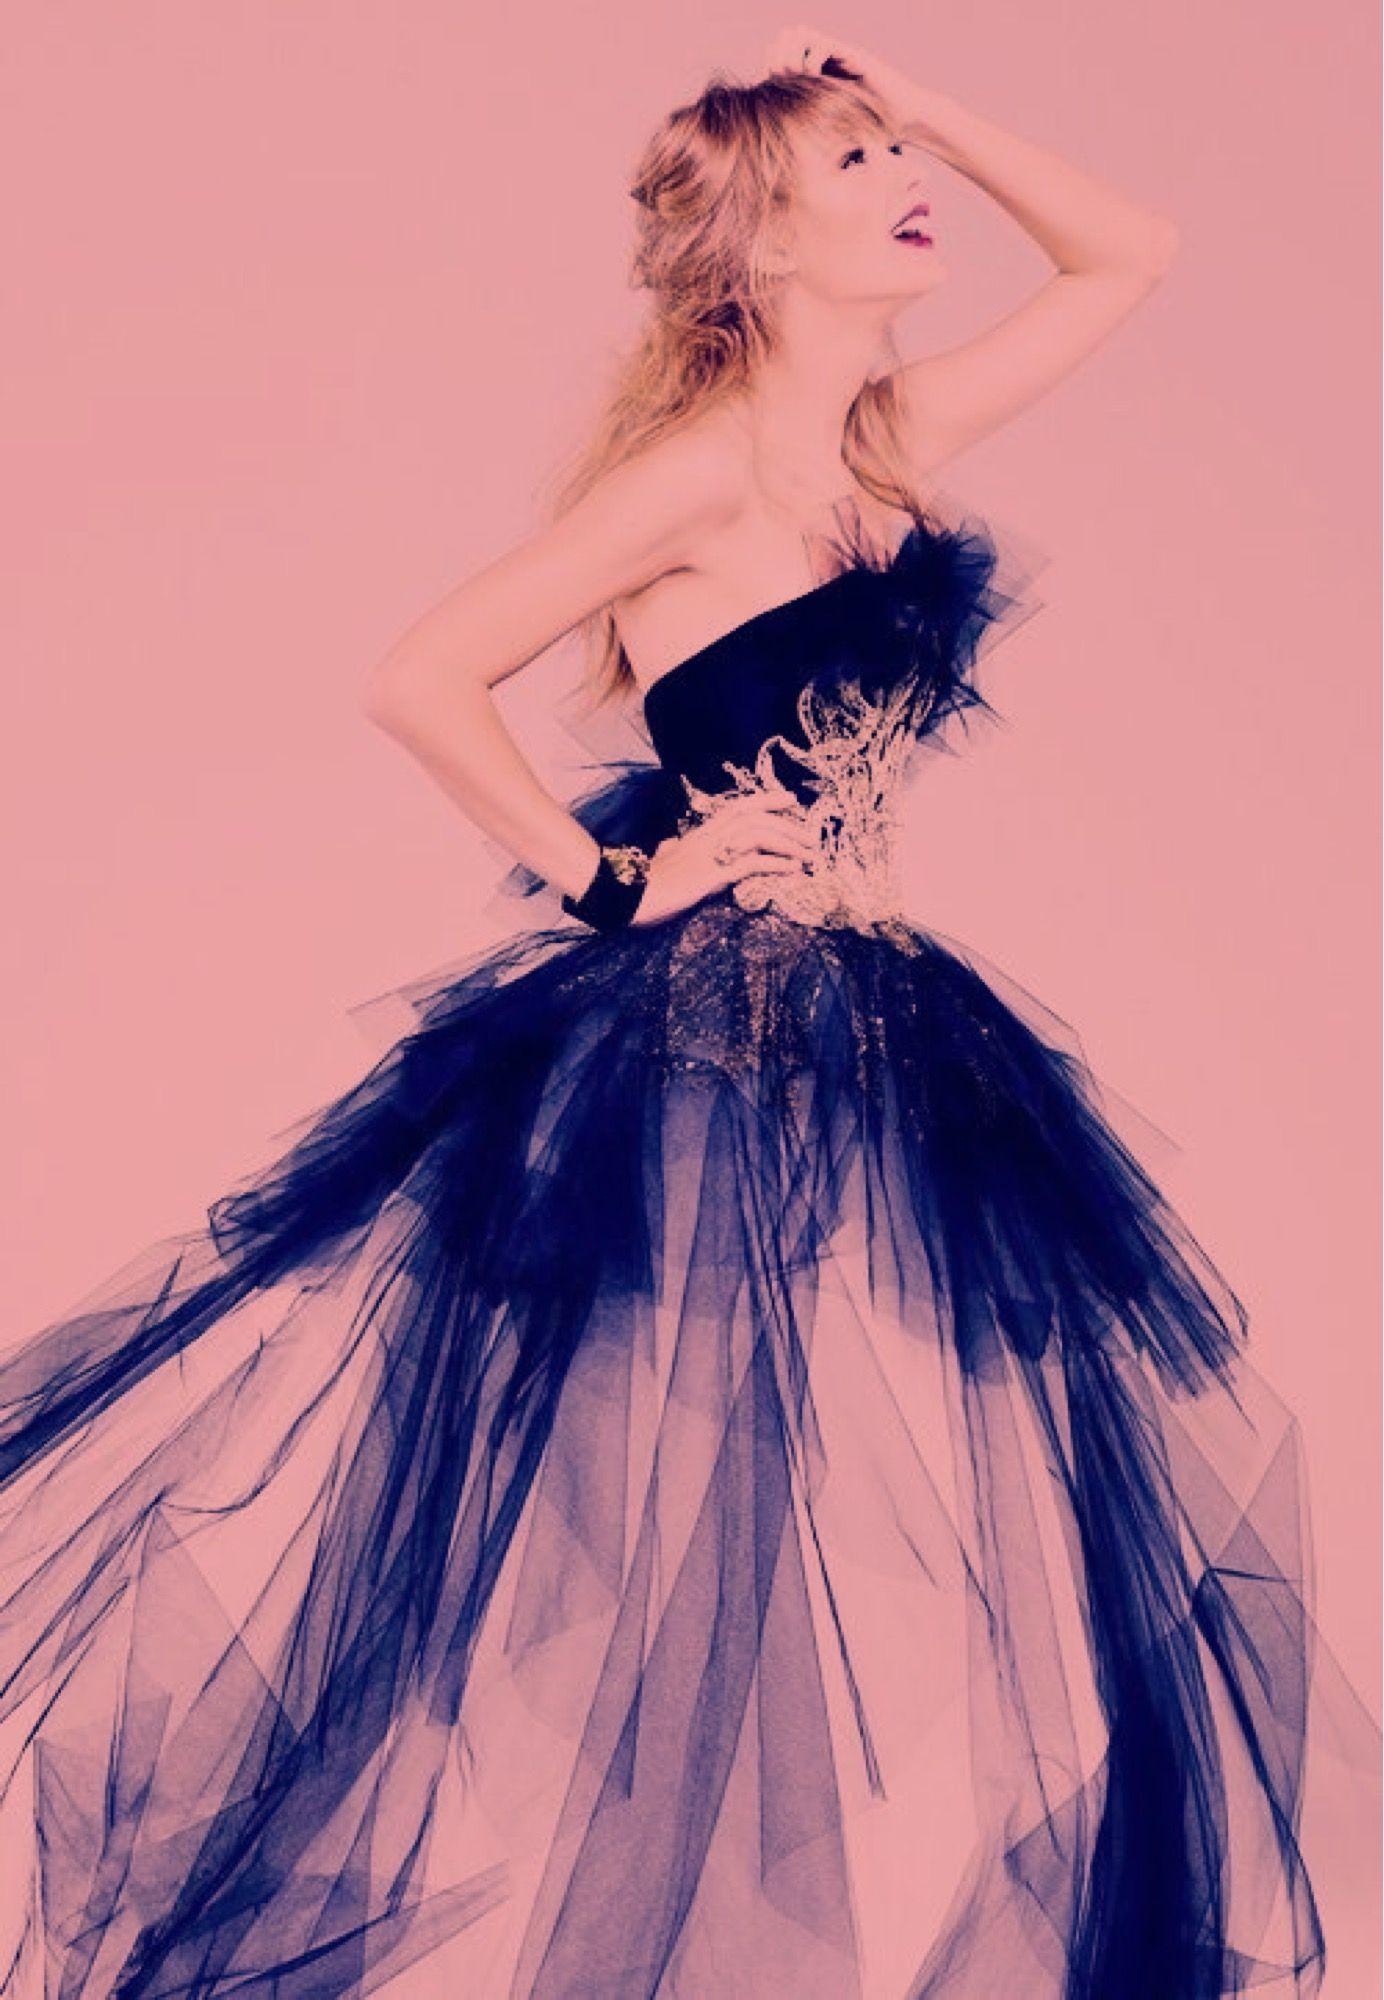 Taylor Swift duo tone portrait | Taylor | Pinterest